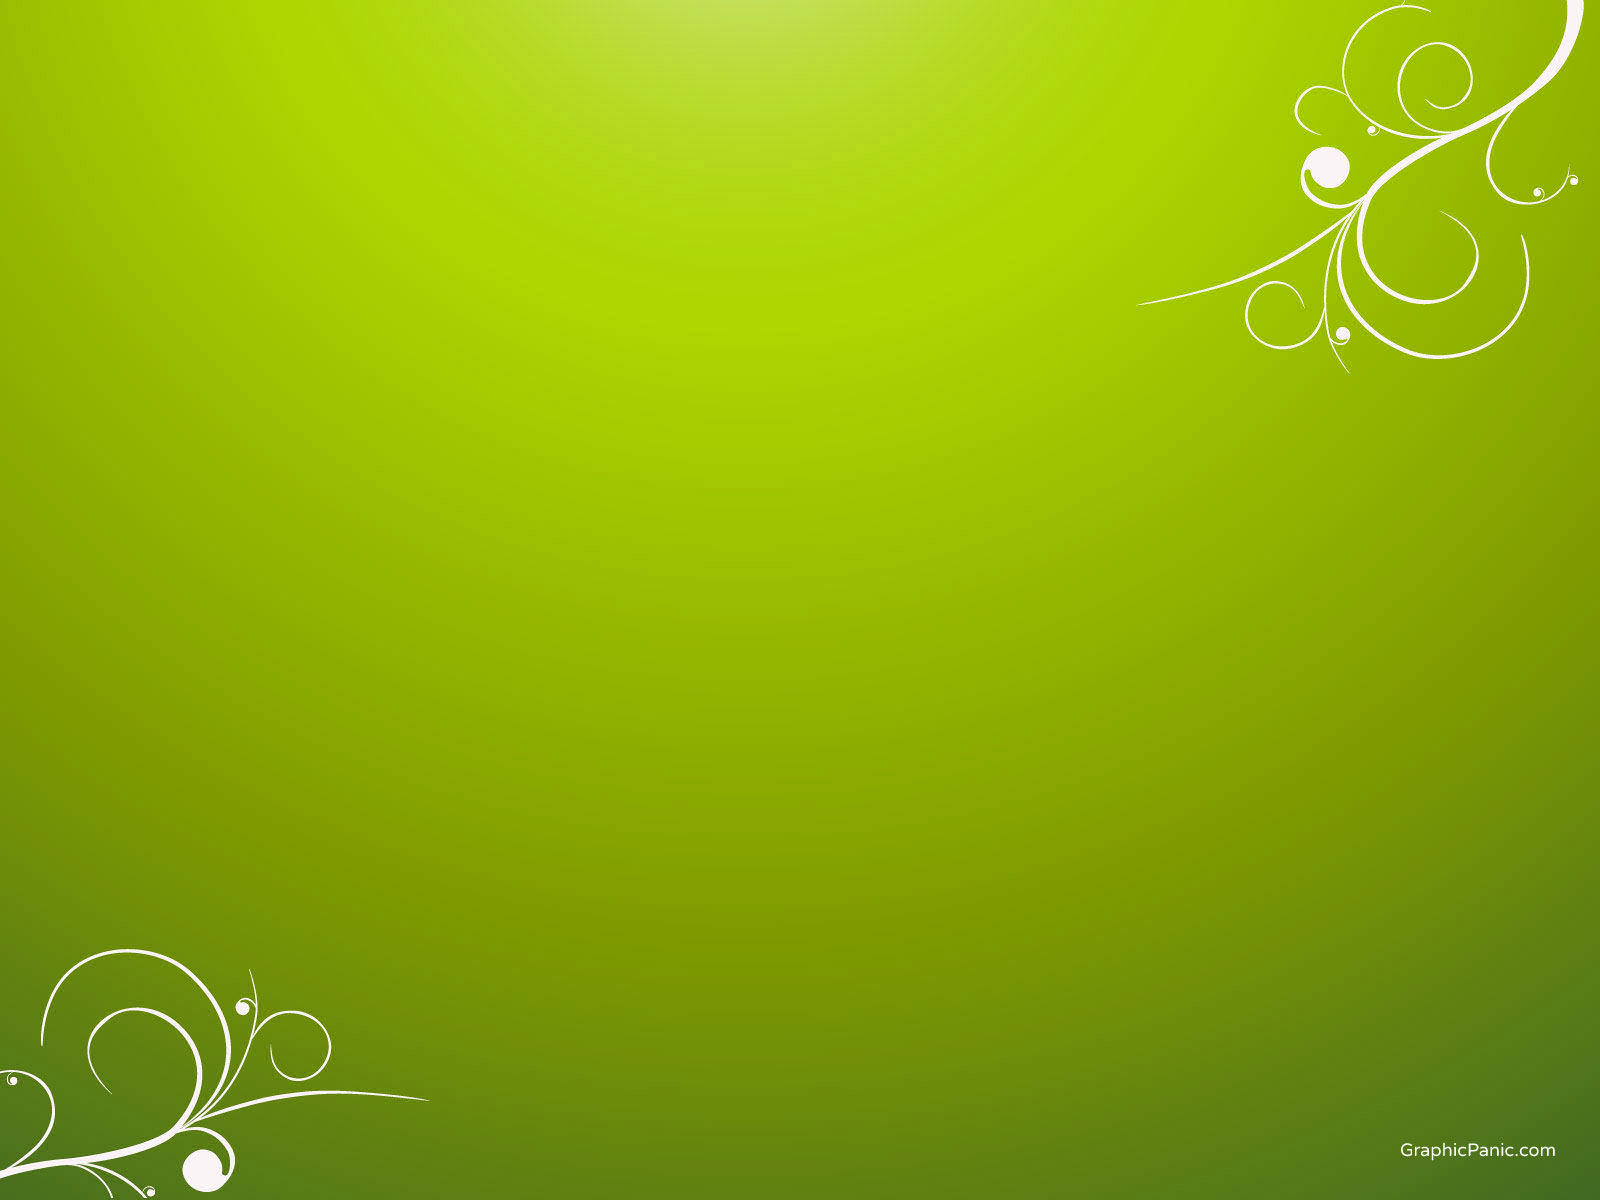 html full screen background slideshow powerpoint